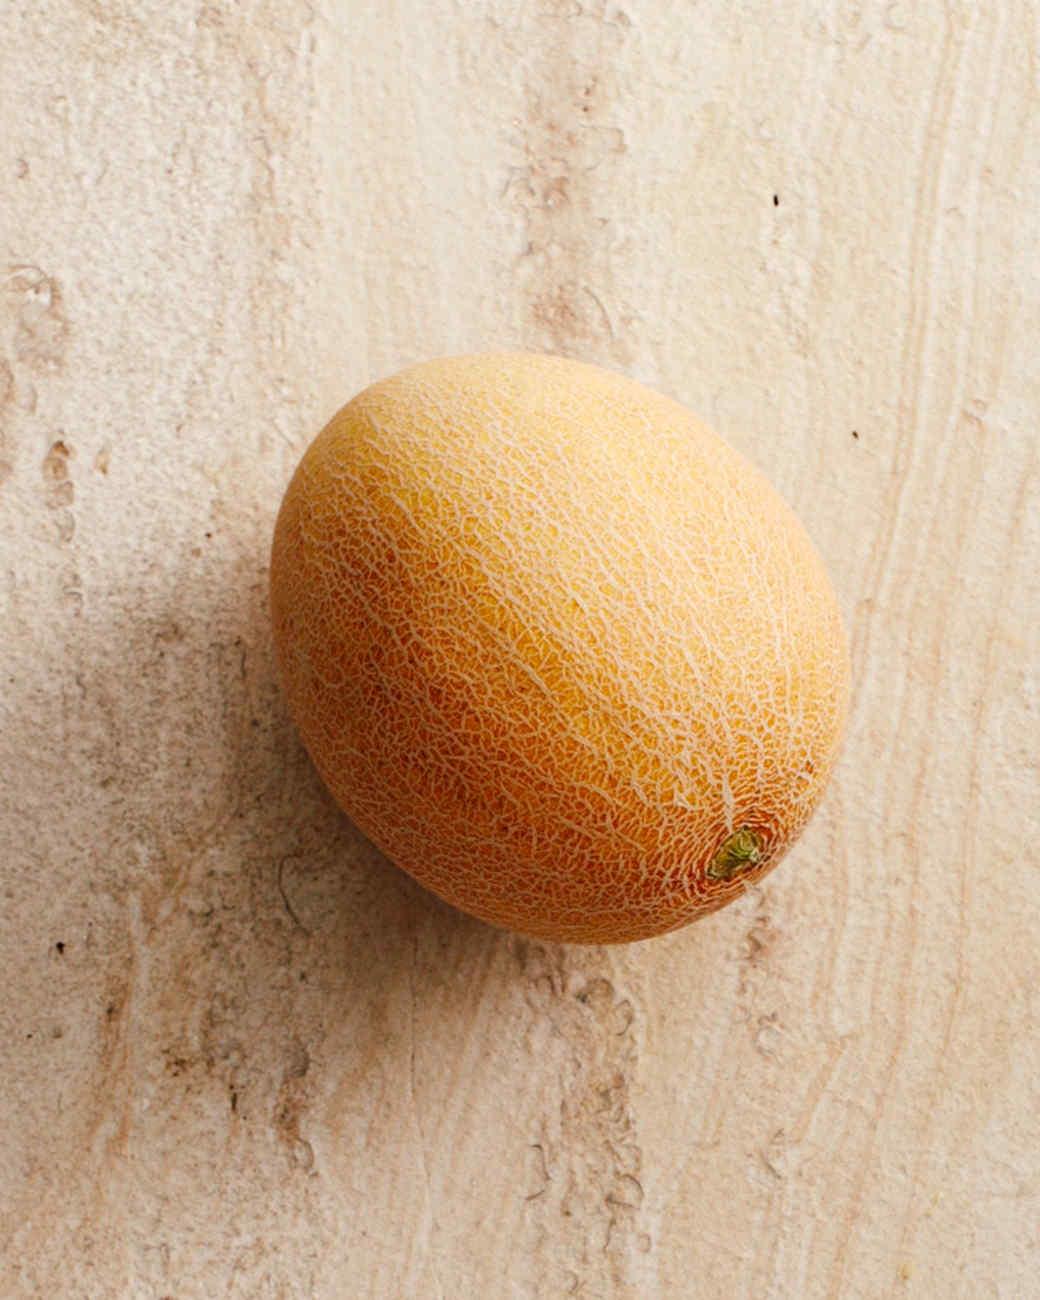 melon-ipad-sherlyn-0190-ld110630-0614.jpg